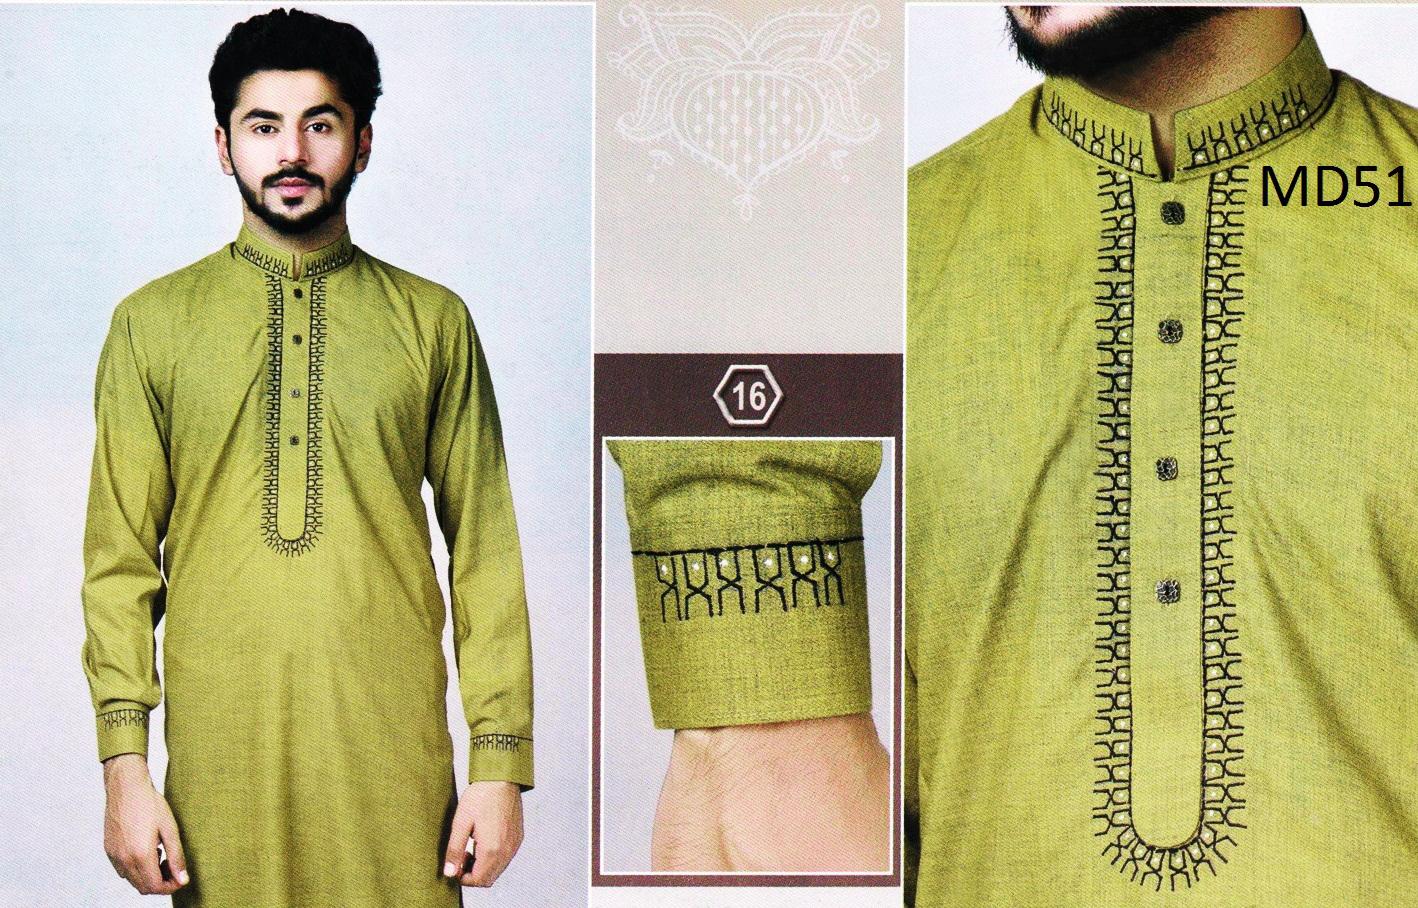 md51-karachi-embroidery-vol-2-green.jpg